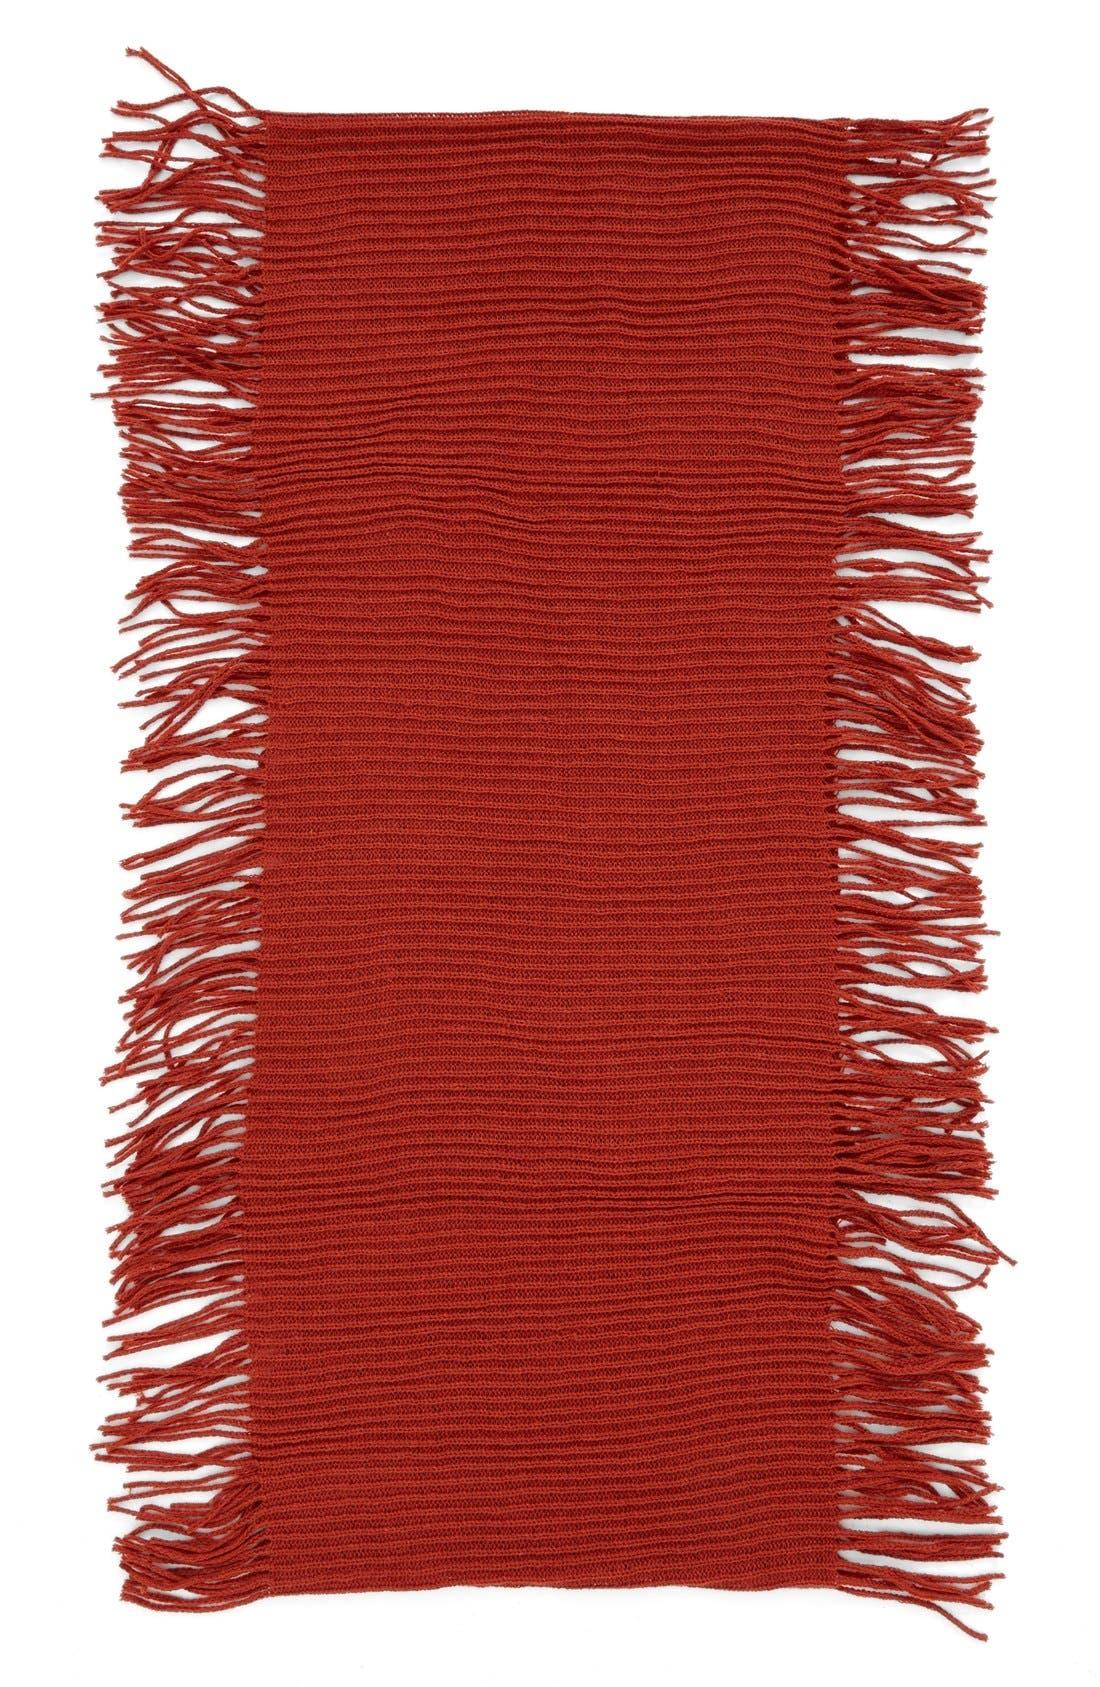 Rib Knit Fringe Infinity Scarf,                             Alternate thumbnail 11, color,